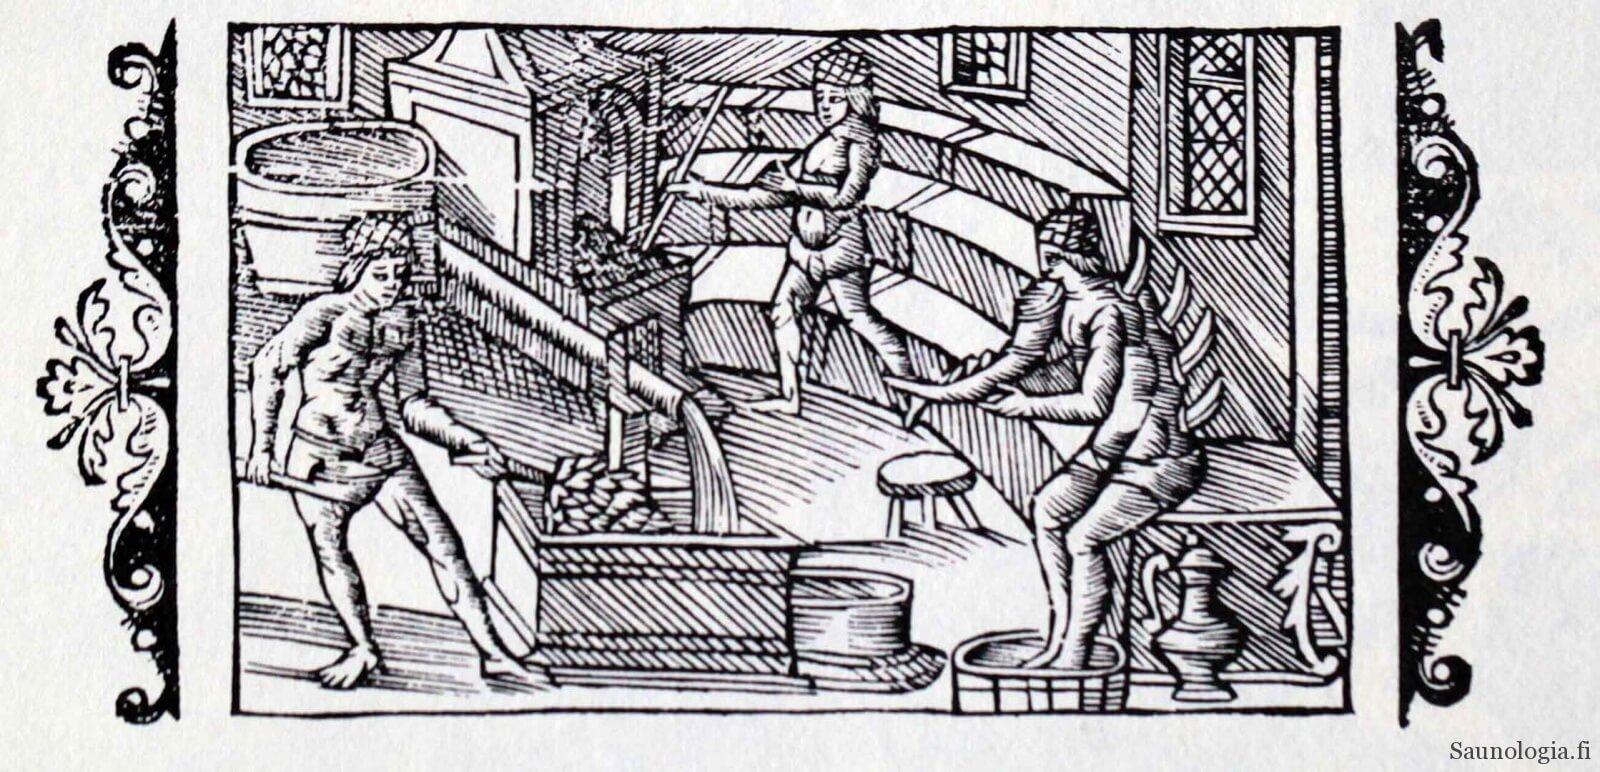 1500-Olaus_Magnus-Medieval_sauna_bathing-BANNER